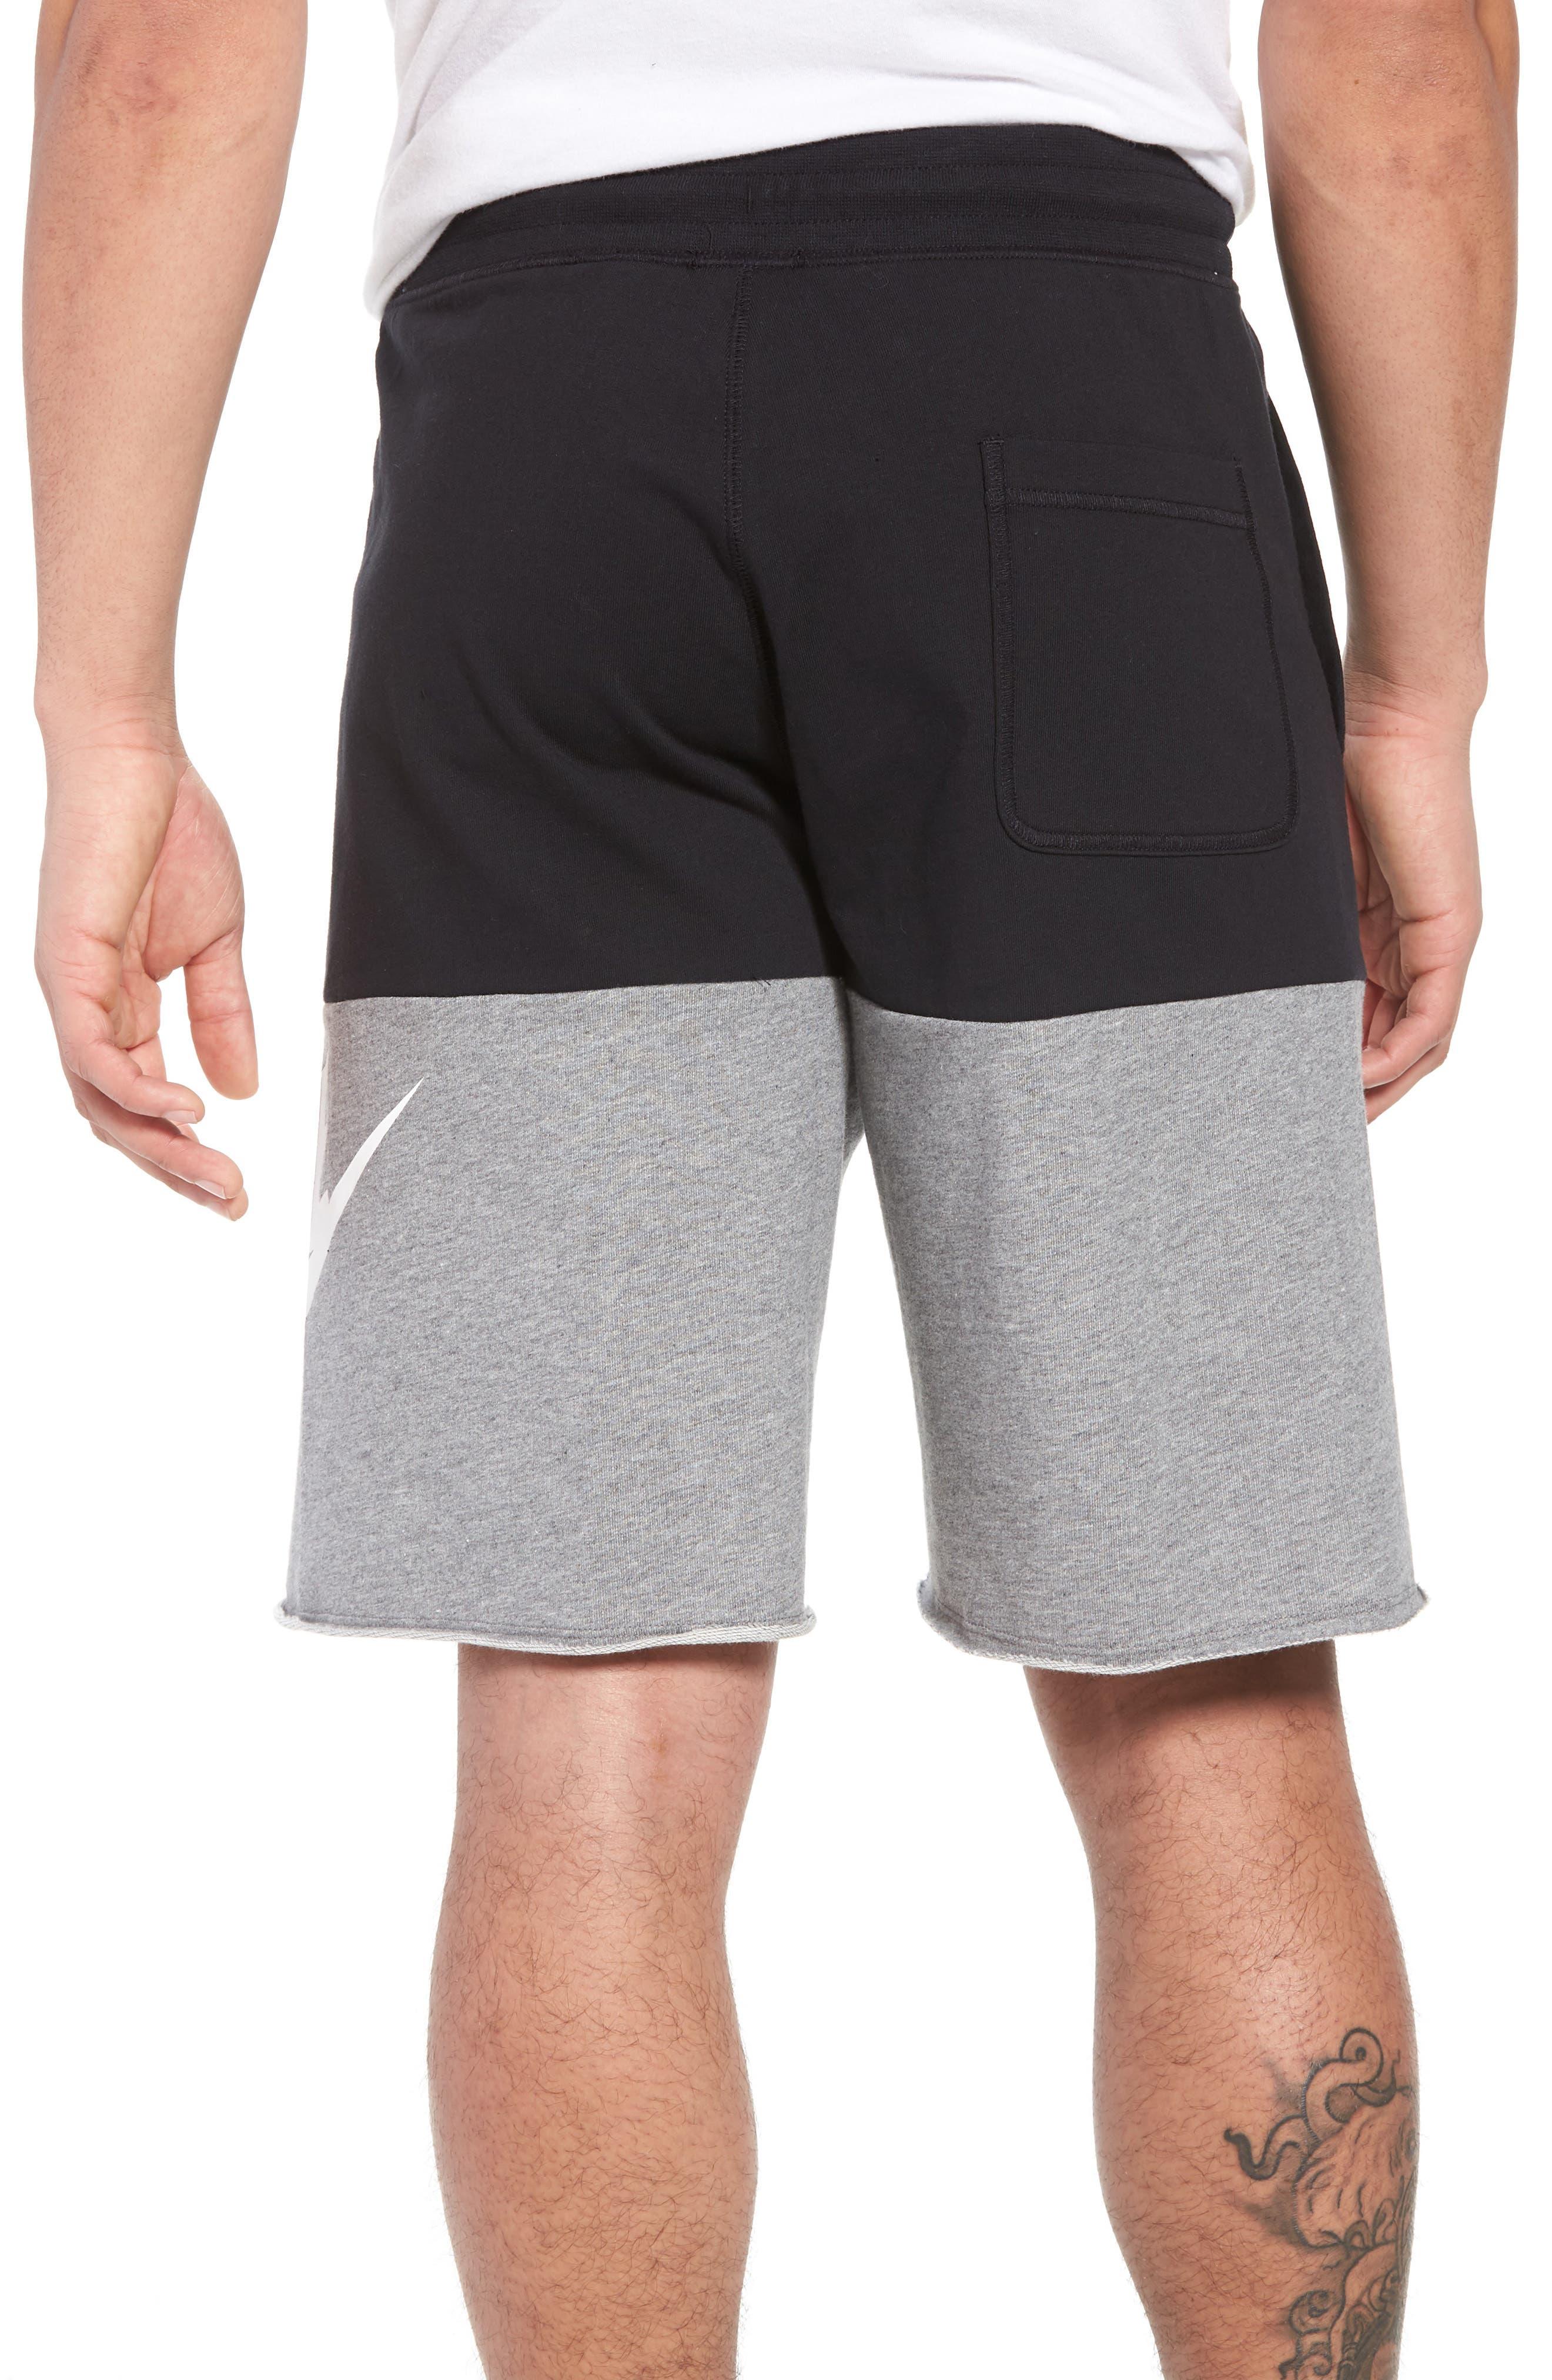 NSW Franchise GX3 Shorts,                             Alternate thumbnail 2, color,                             Black/ Carbon Heather/ White